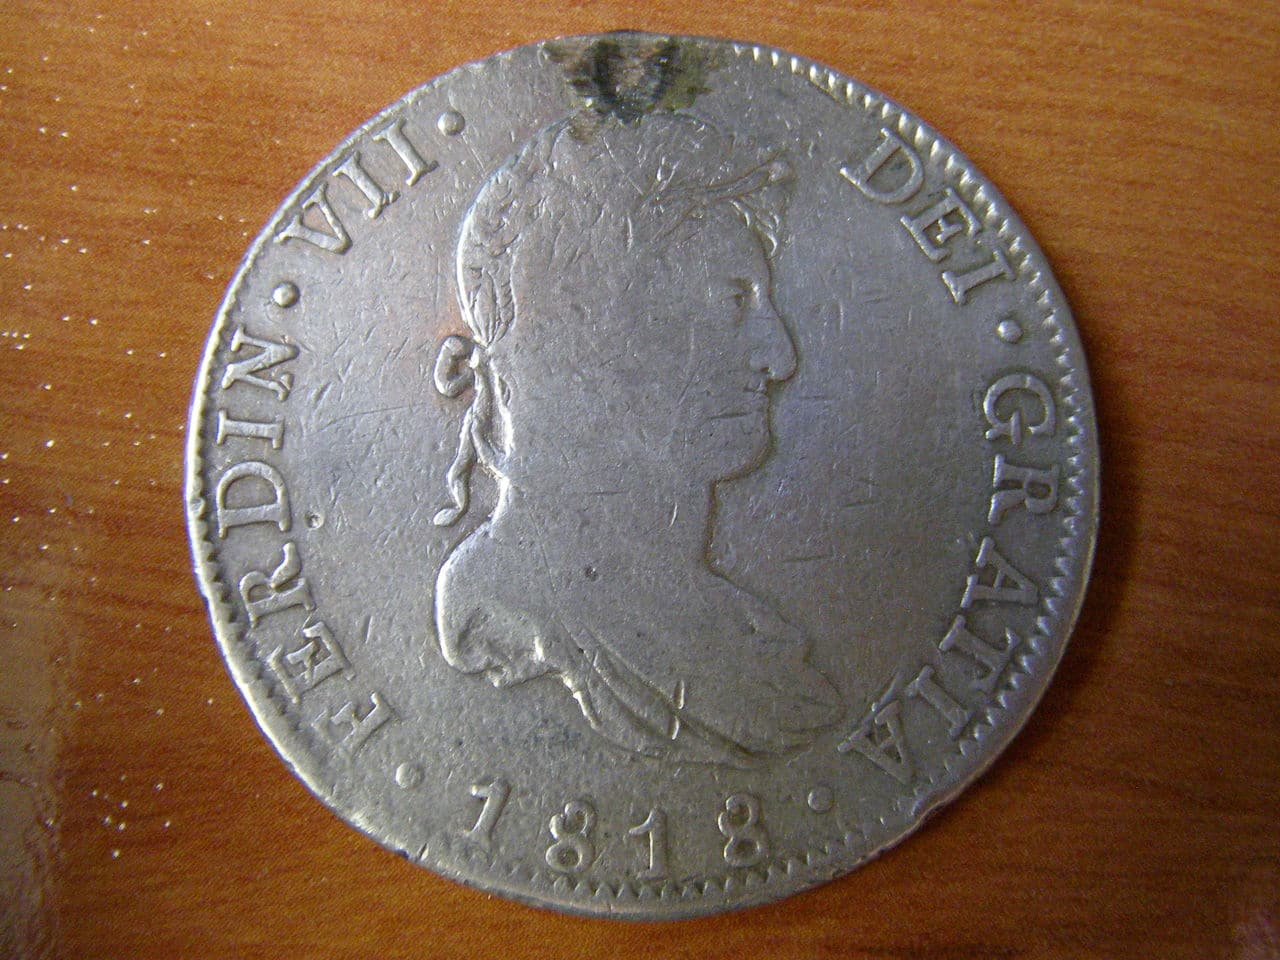 8 Reales. 1818. Fernando VII. - México. P1010073